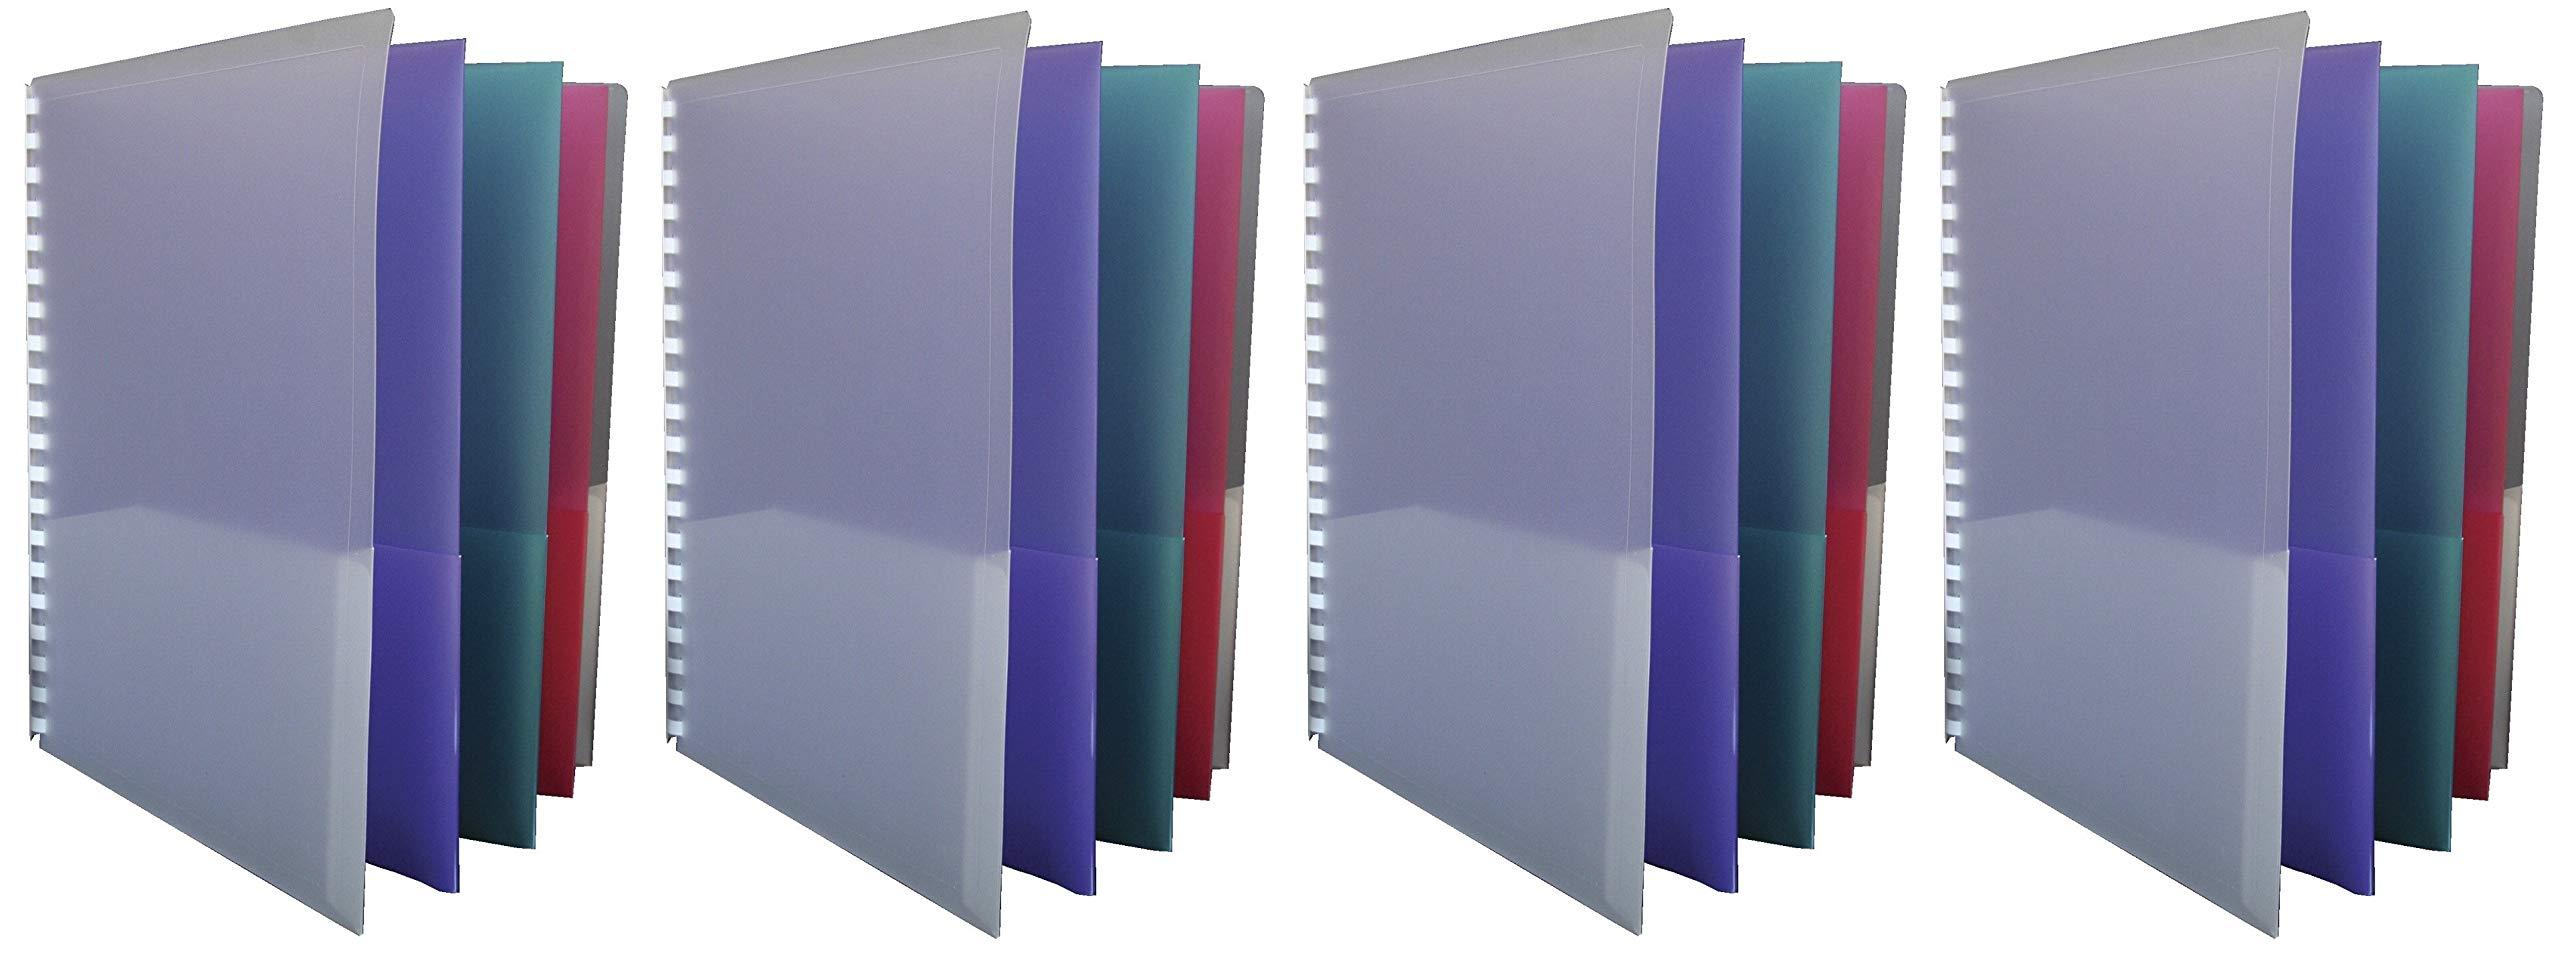 School Smart 8-Pocket Project Organizer, Polypropylene, Multicolor (Fоur Paсk) by School Smart